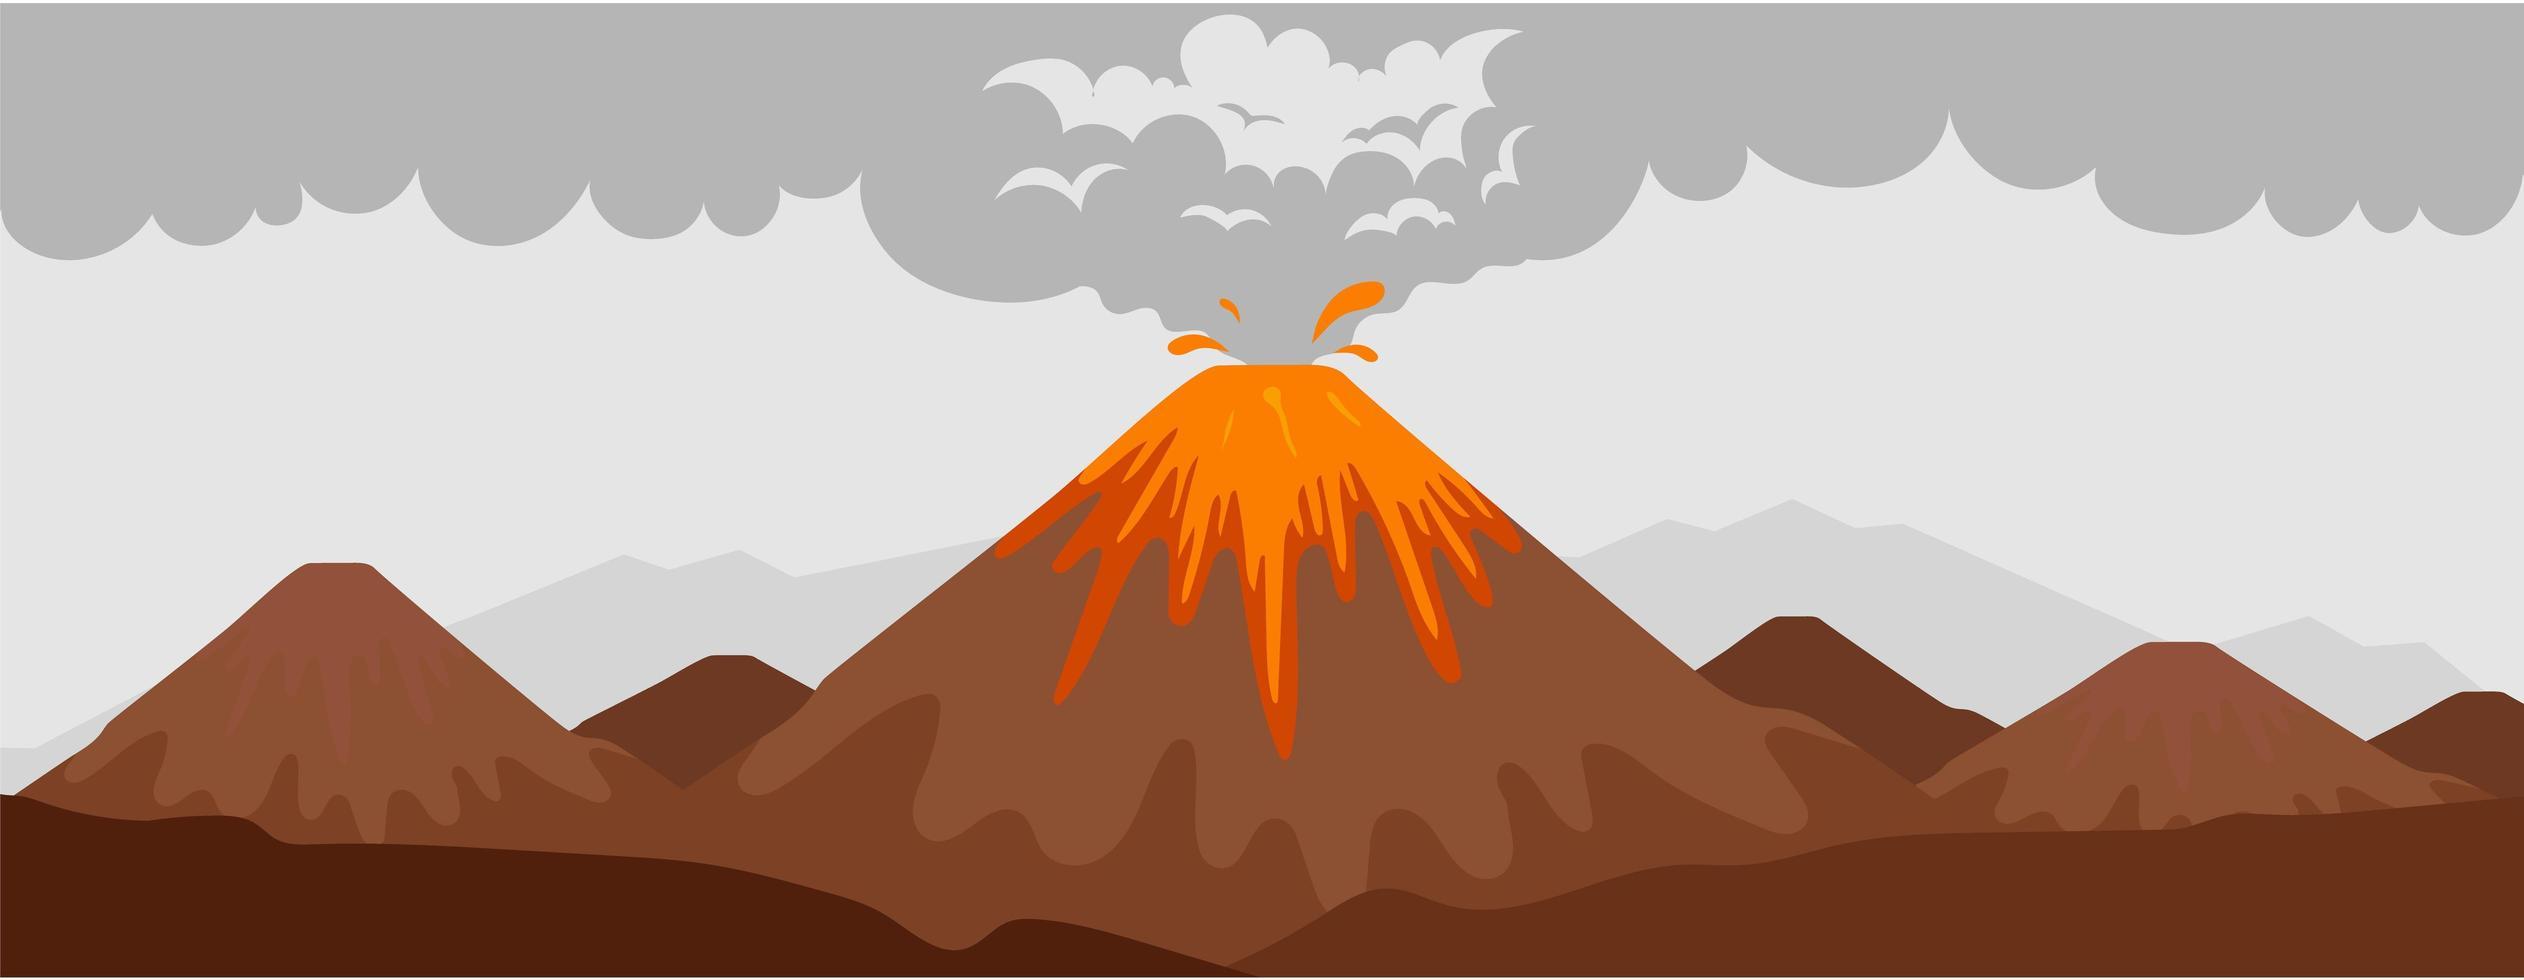 Vulkanausbruchszene vektor